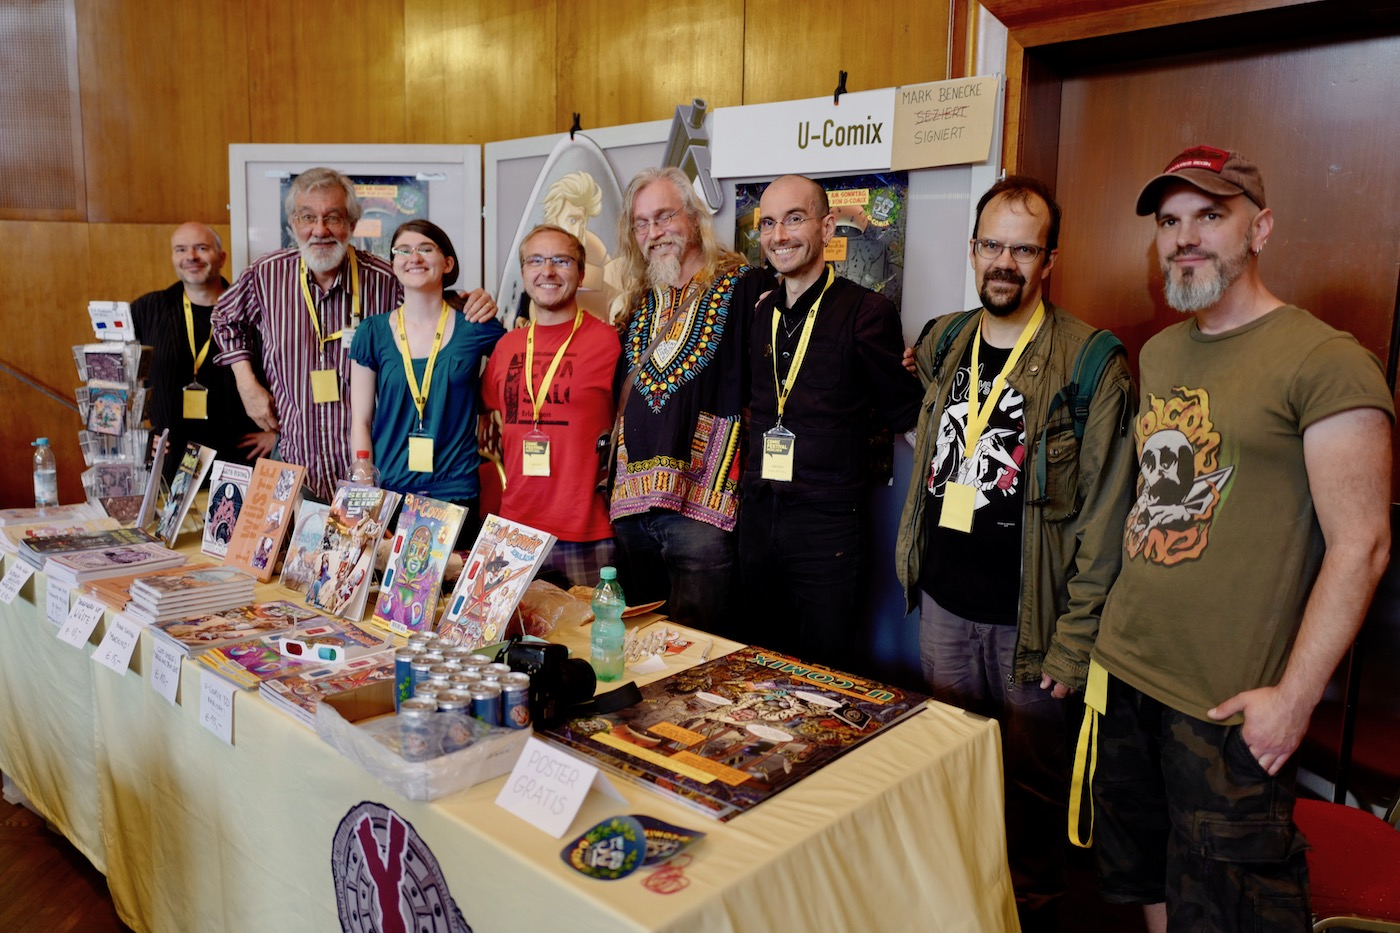 mark_benecke_comic_festival_muenchen_munich_comic_con_2019 - 40.jpg